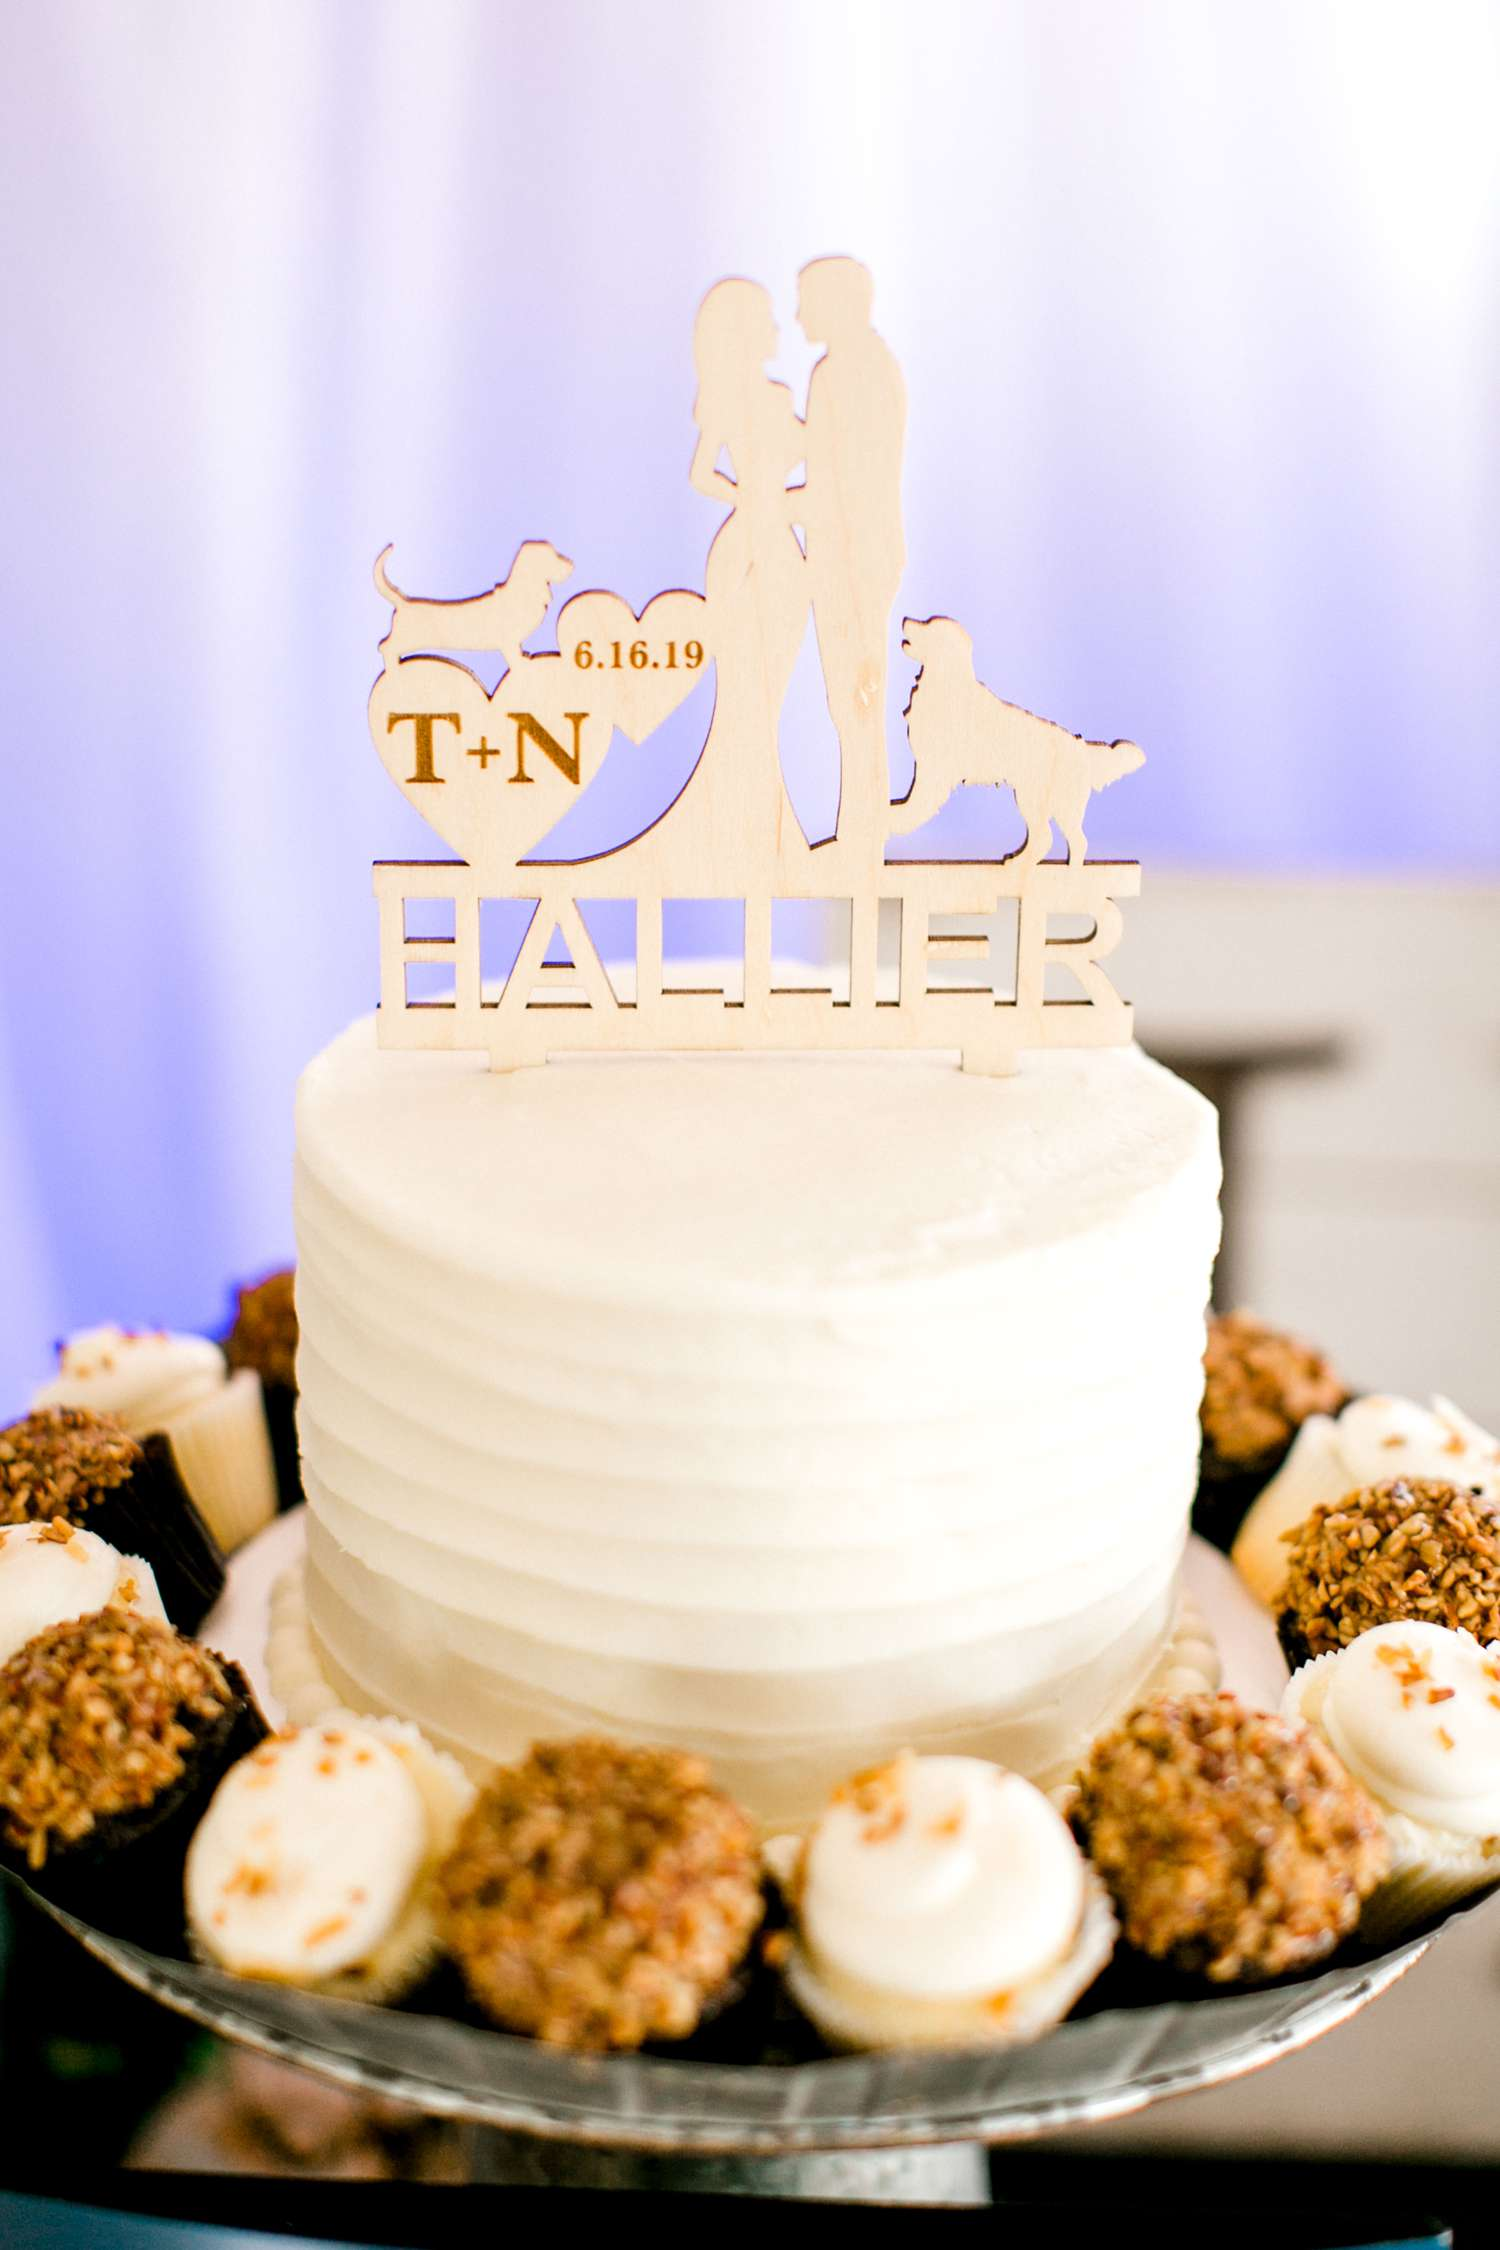 TY+NATHAN+HALLIER+ALLEEJ+WEDDING+PHOTOGRAPHER+RANSOM+CANYON_0100.jpg